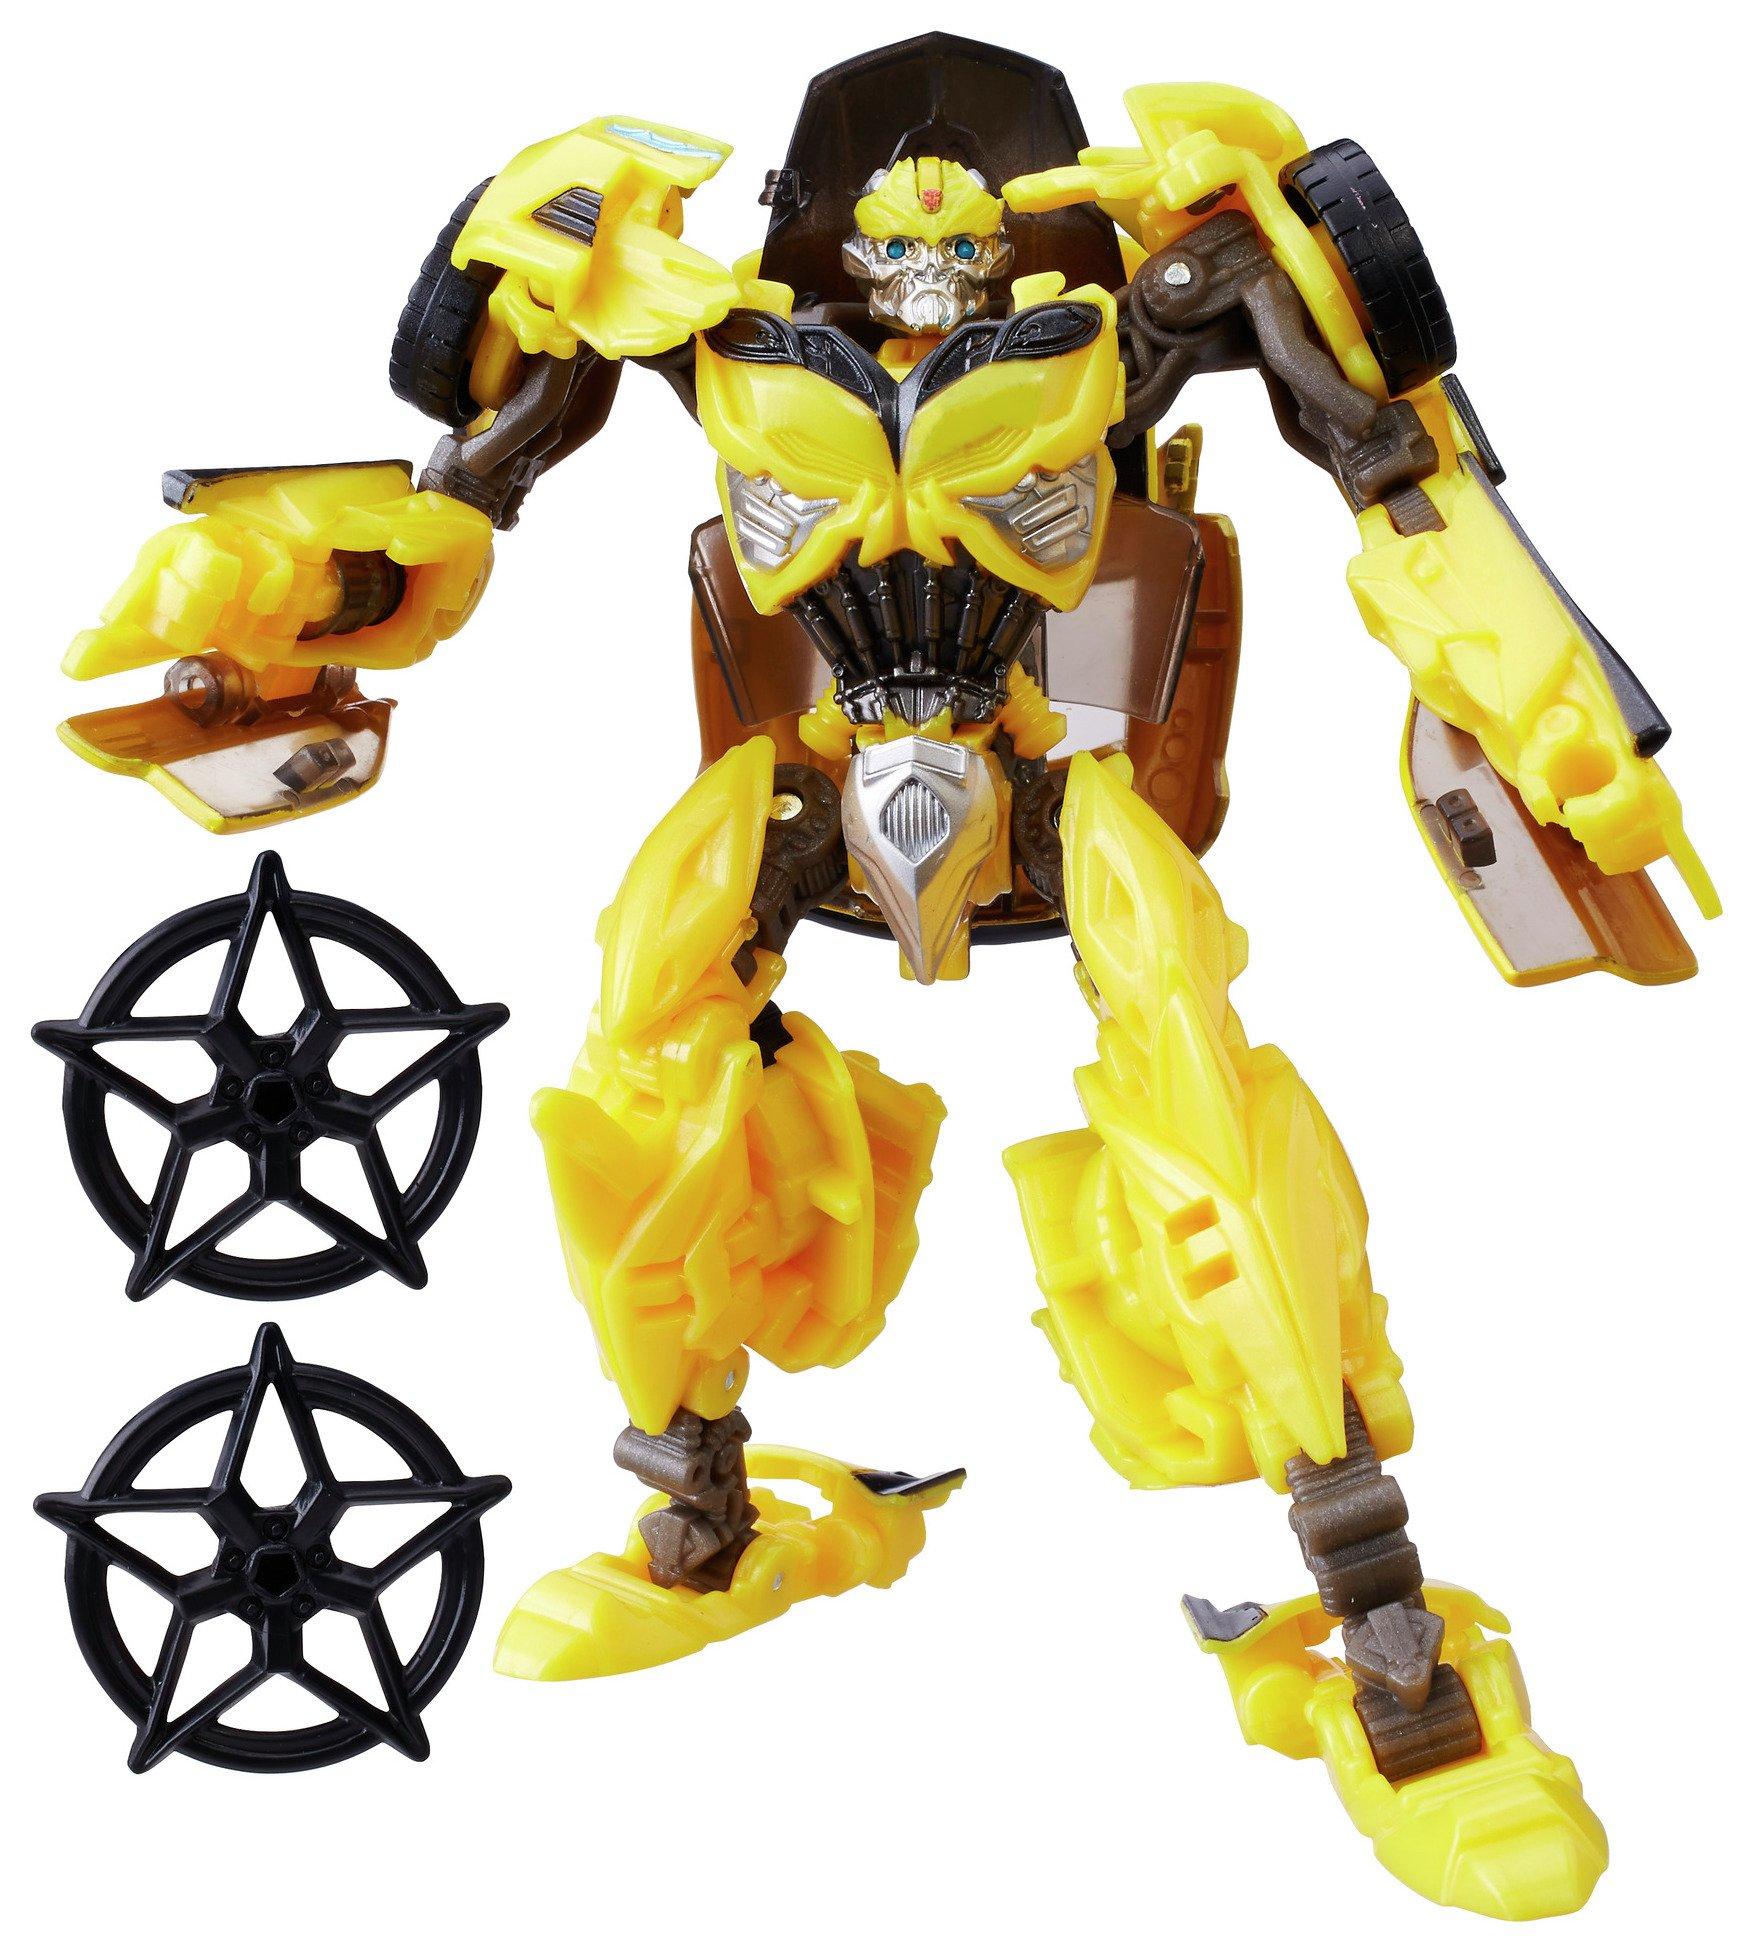 Transformers Premier Edition Deluxe Bumblebee